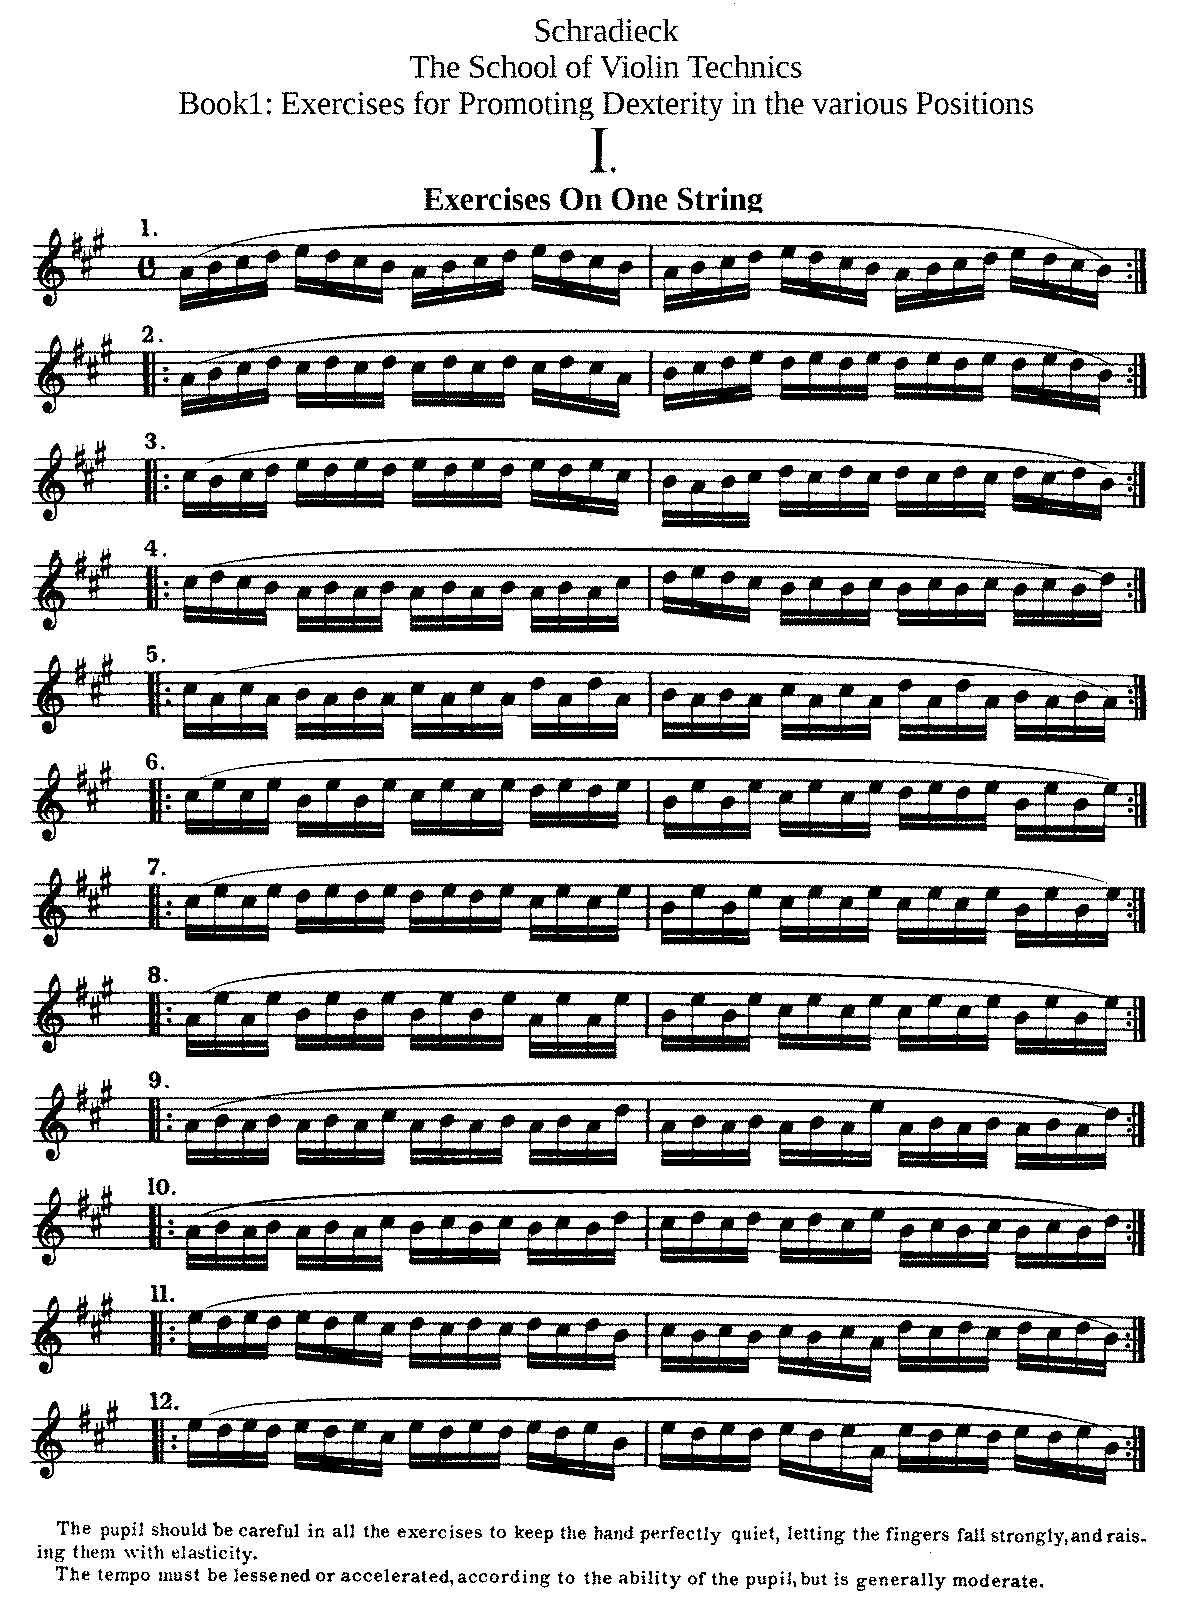 School of Violin Technics (Schradieck, Henry) - IMSLP/Petrucci Music